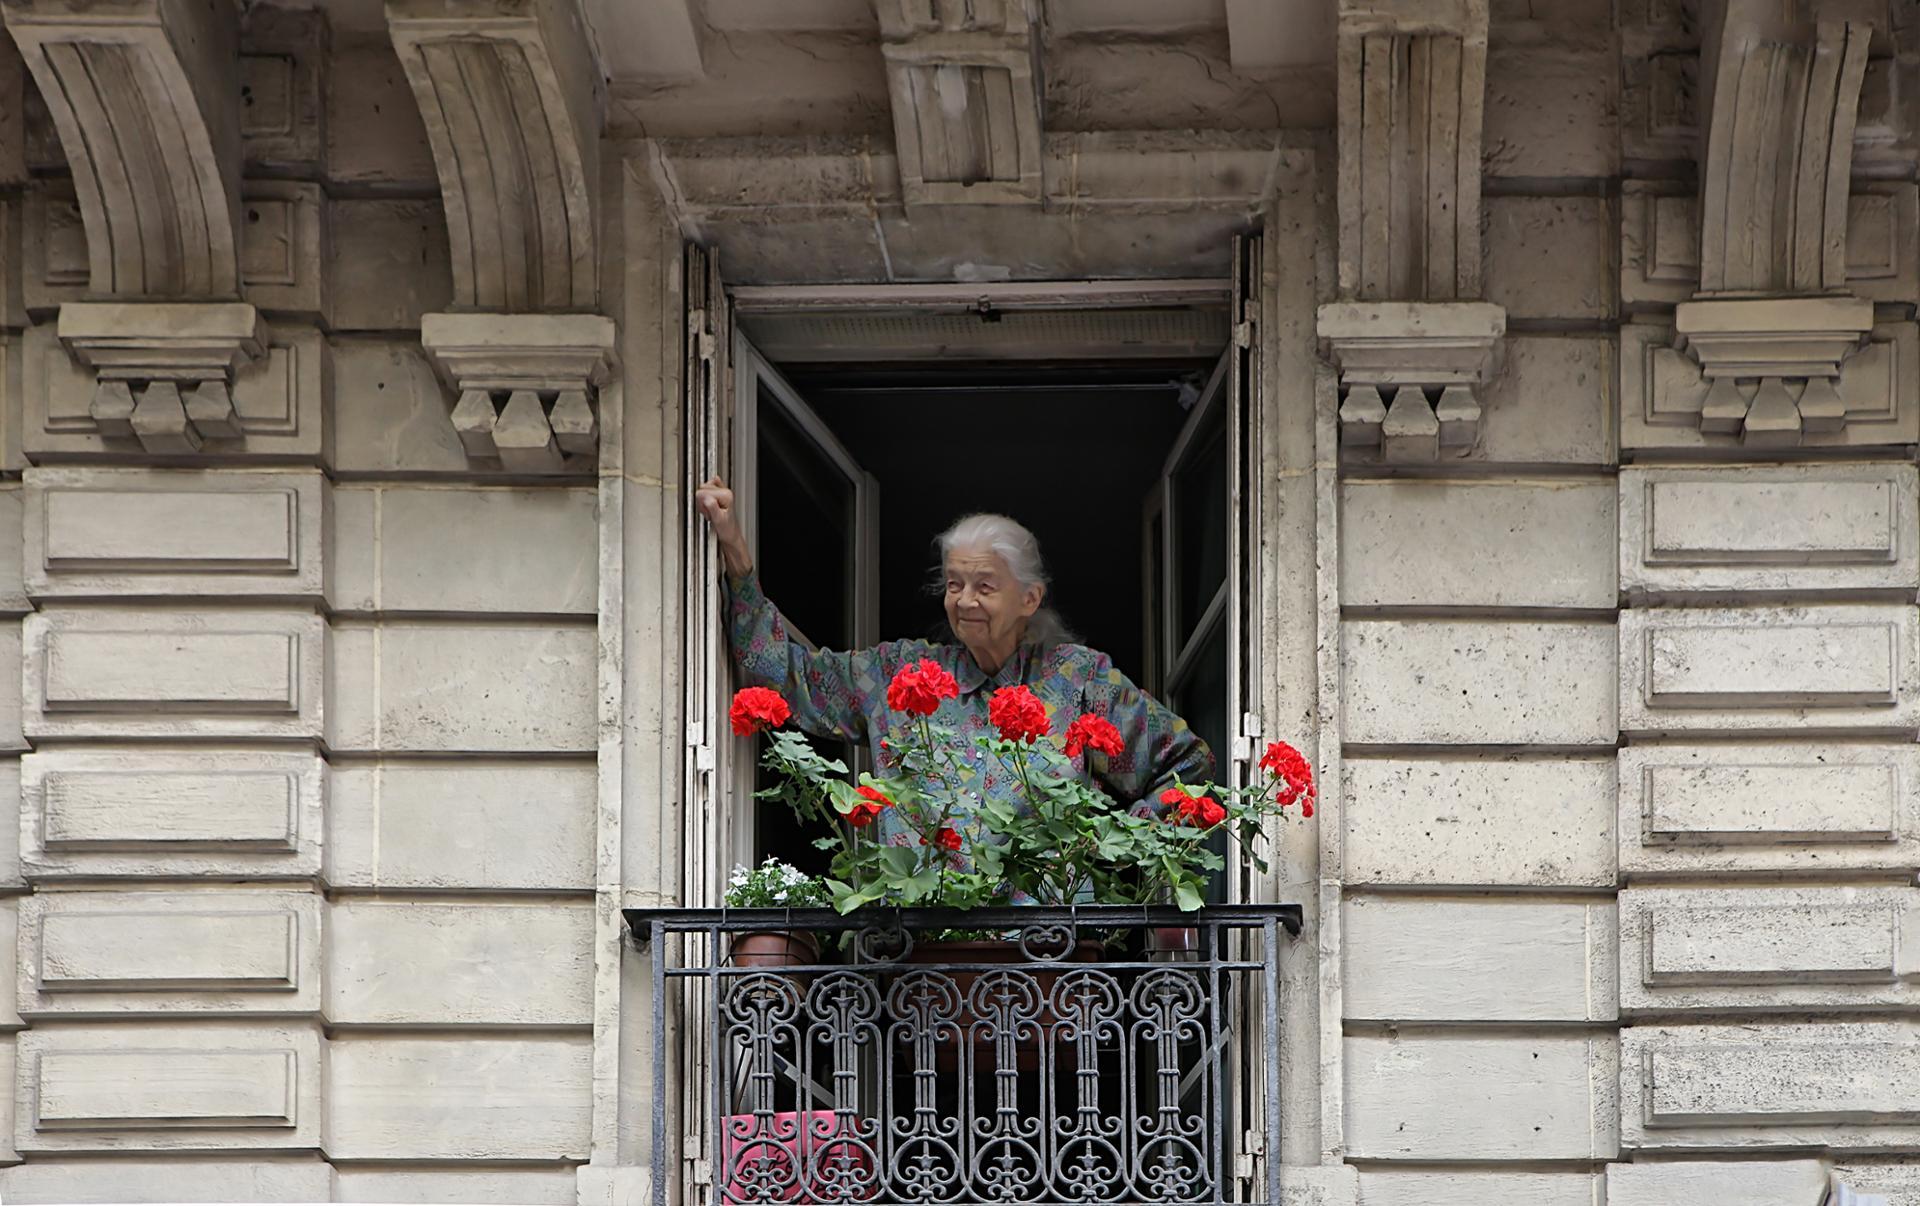 Proverbe, Mamie au balcon, chaton sur l'édredon.